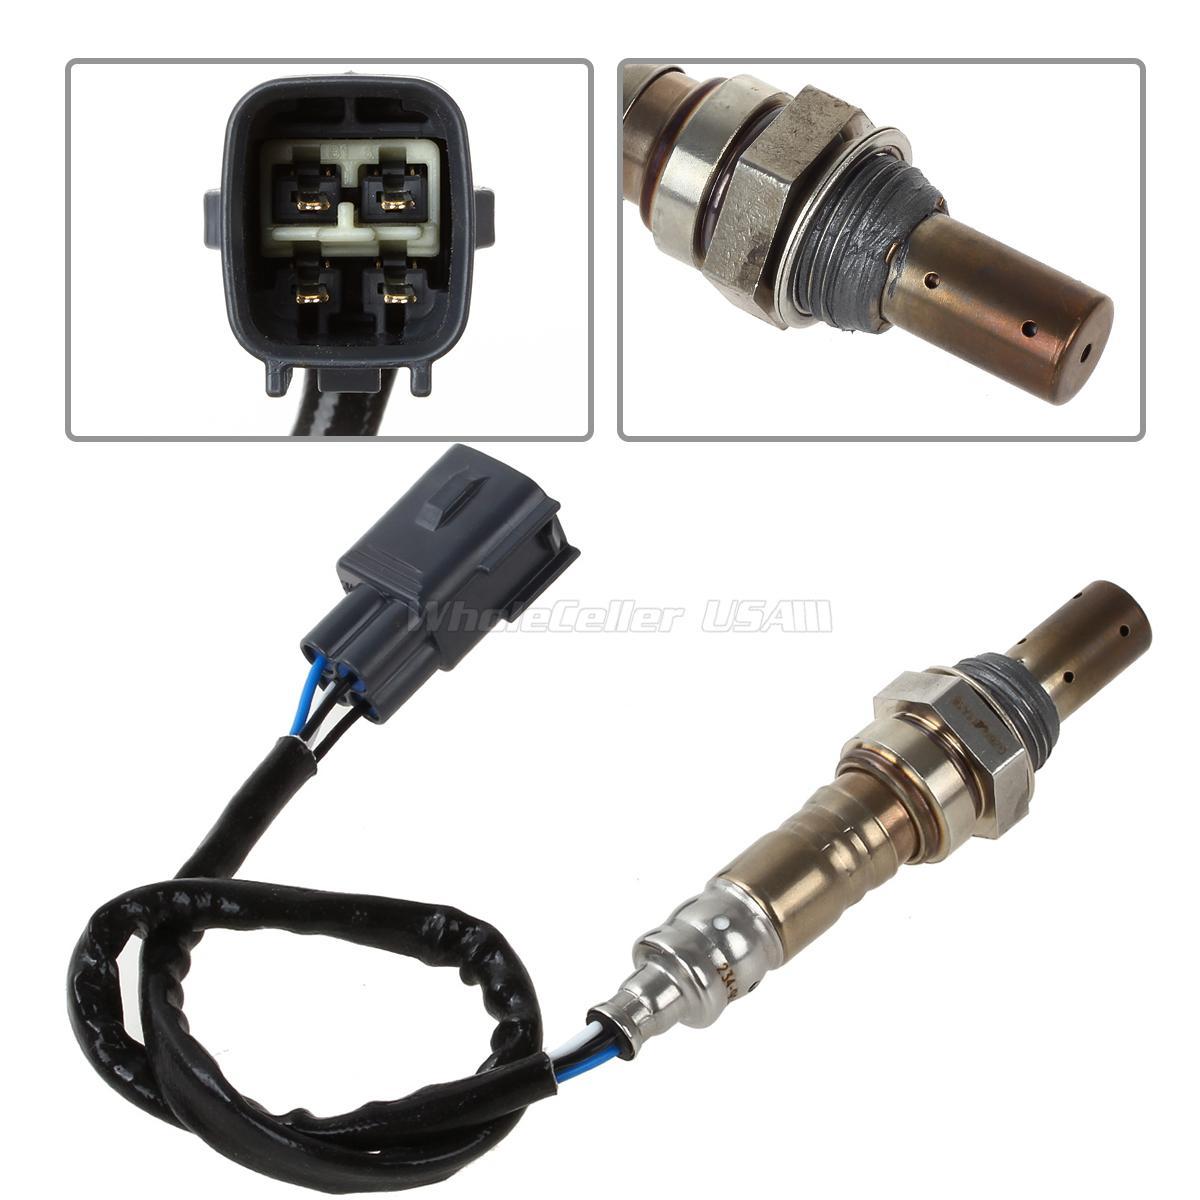 Air Fuel Ratio Oxygen Sensor Upstream 234 9021 For 00 04 Toyota Avalon Wiring Description